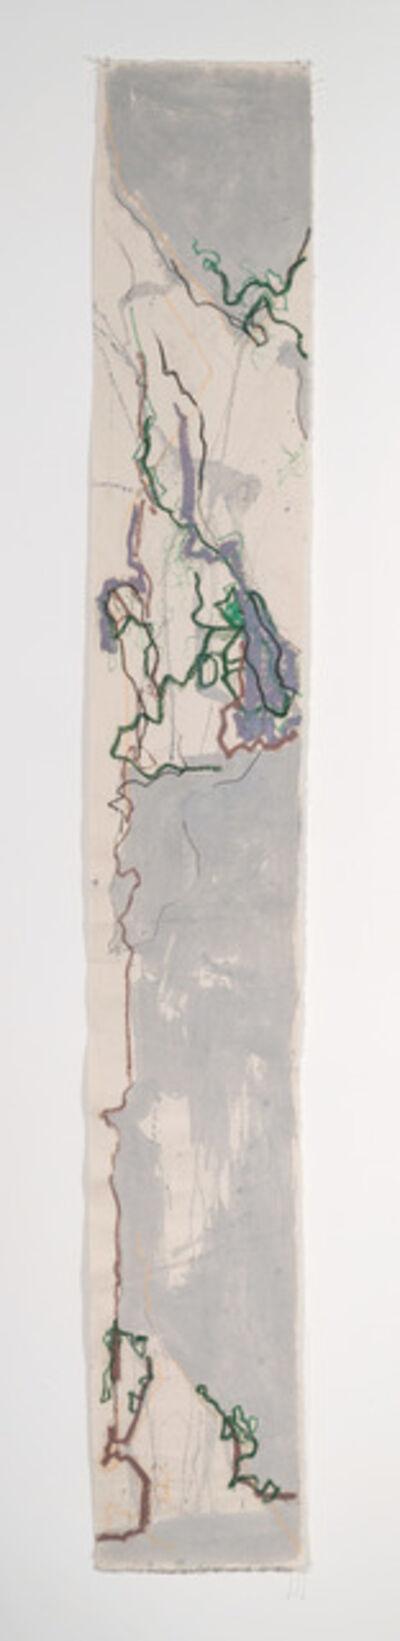 Angela Costanzo Paris, 'Tree Knowledge ', 2018